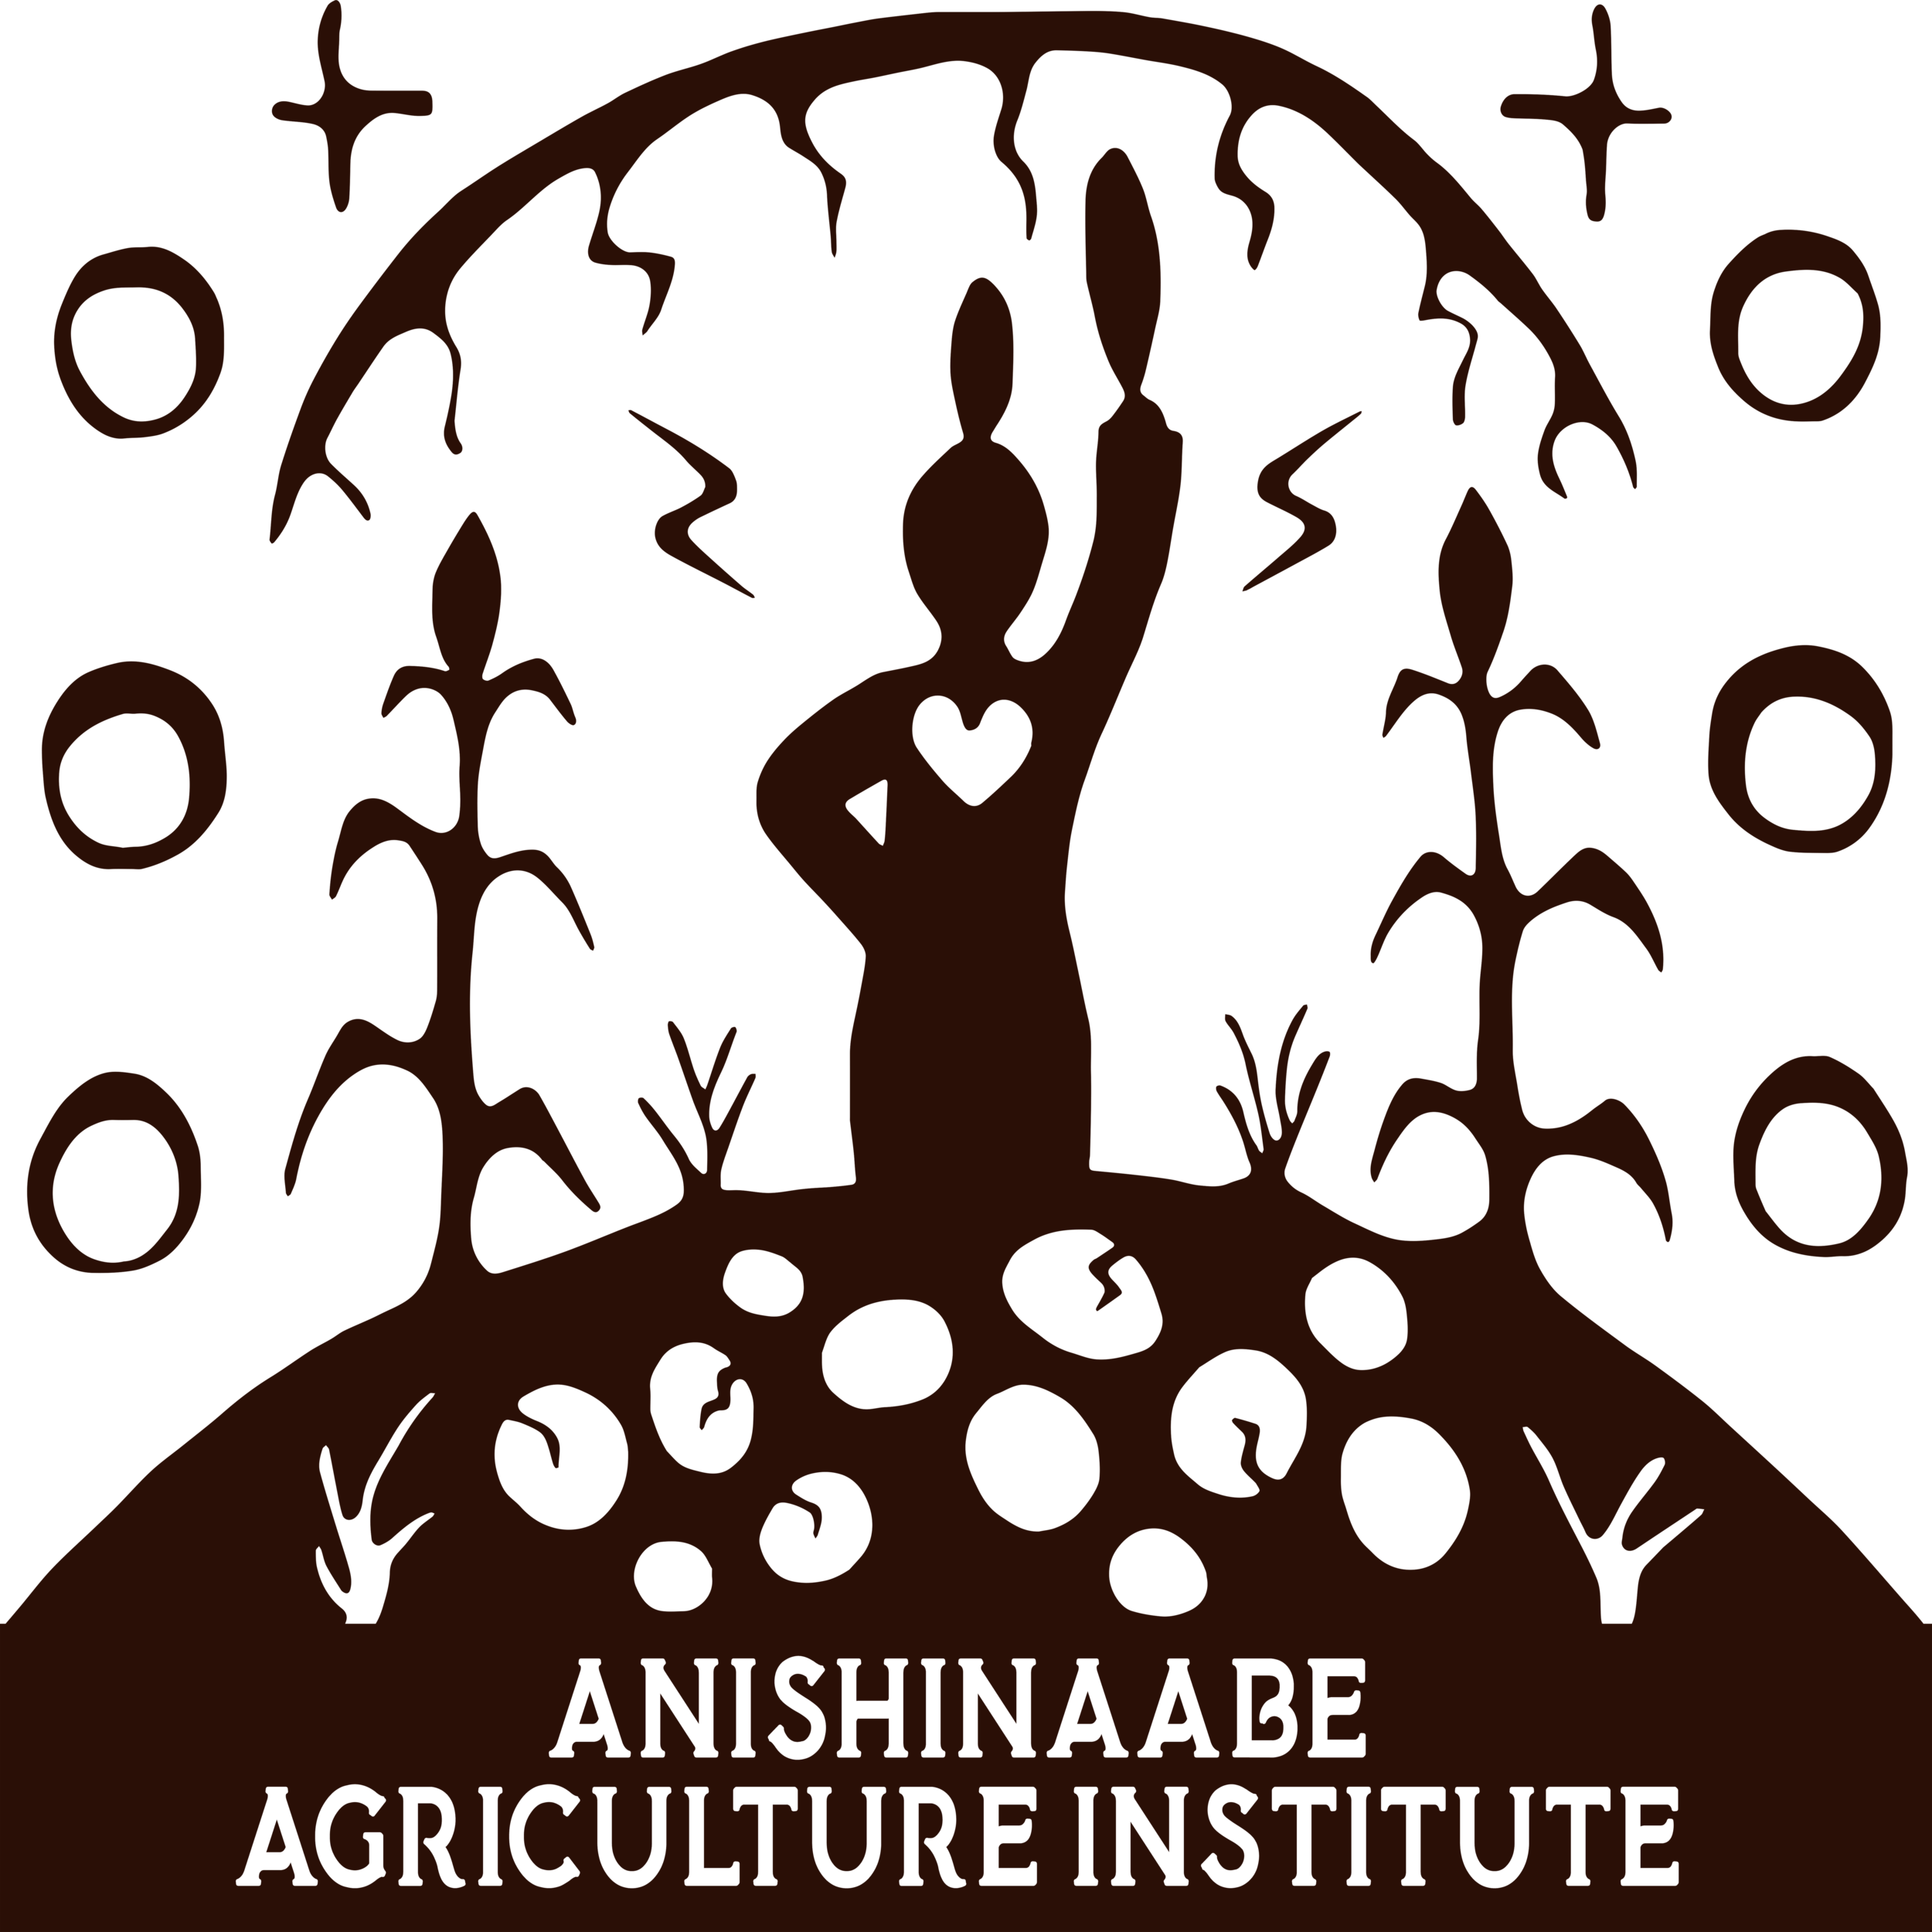 Anishinaabe Agriculture Institute - Horse Nations Program